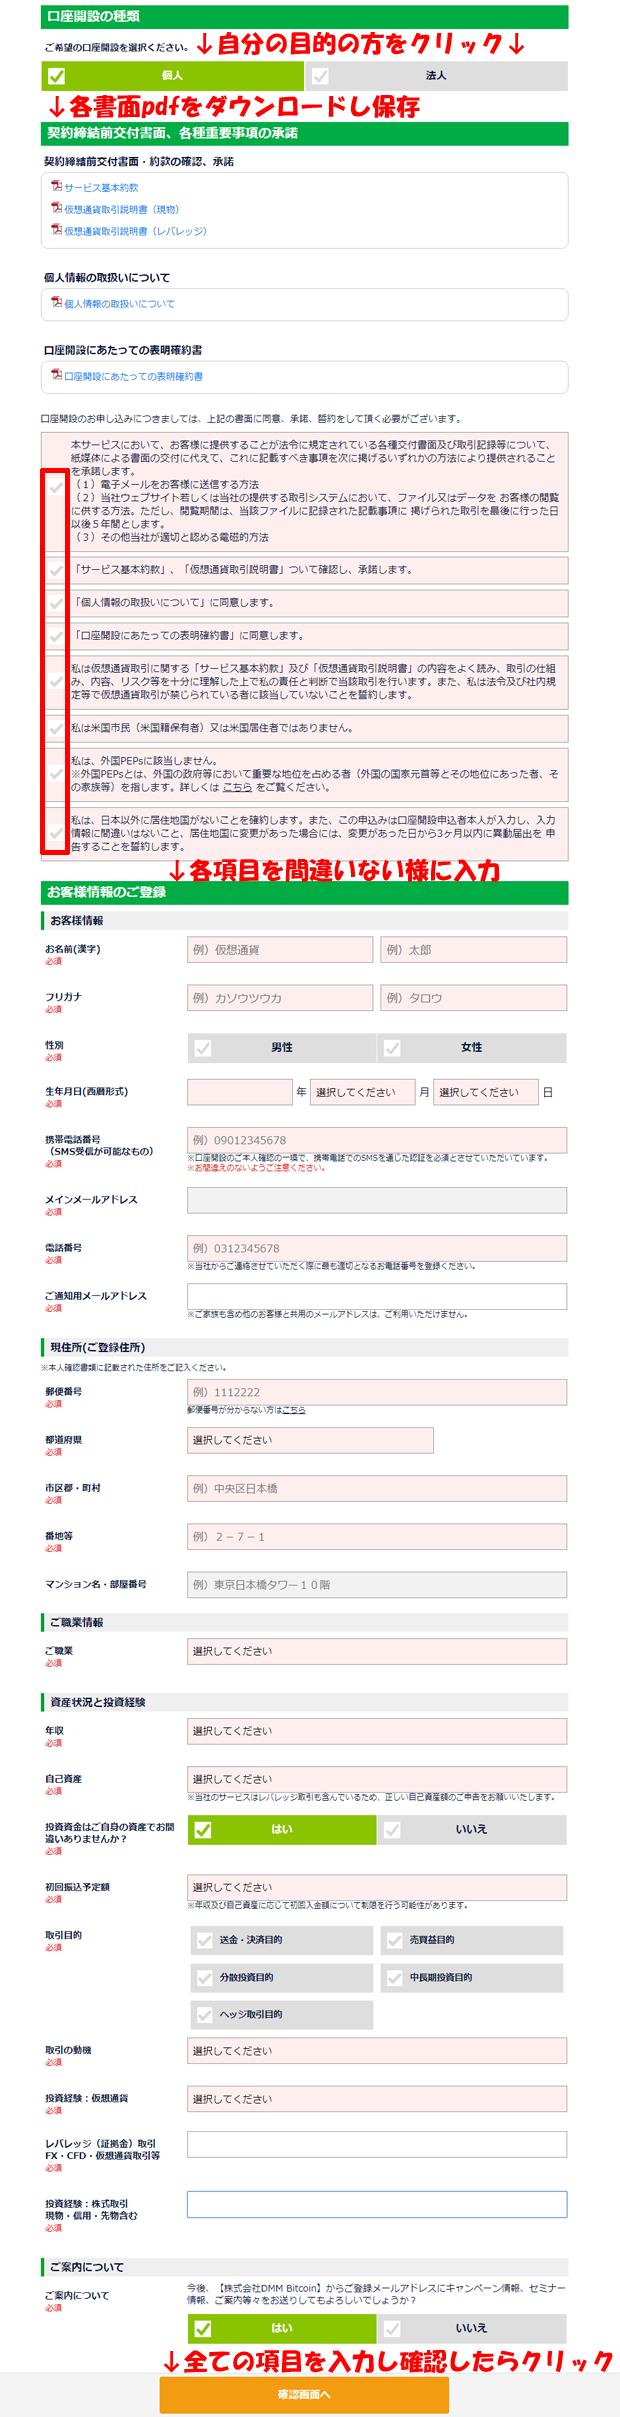 dmm.com_register